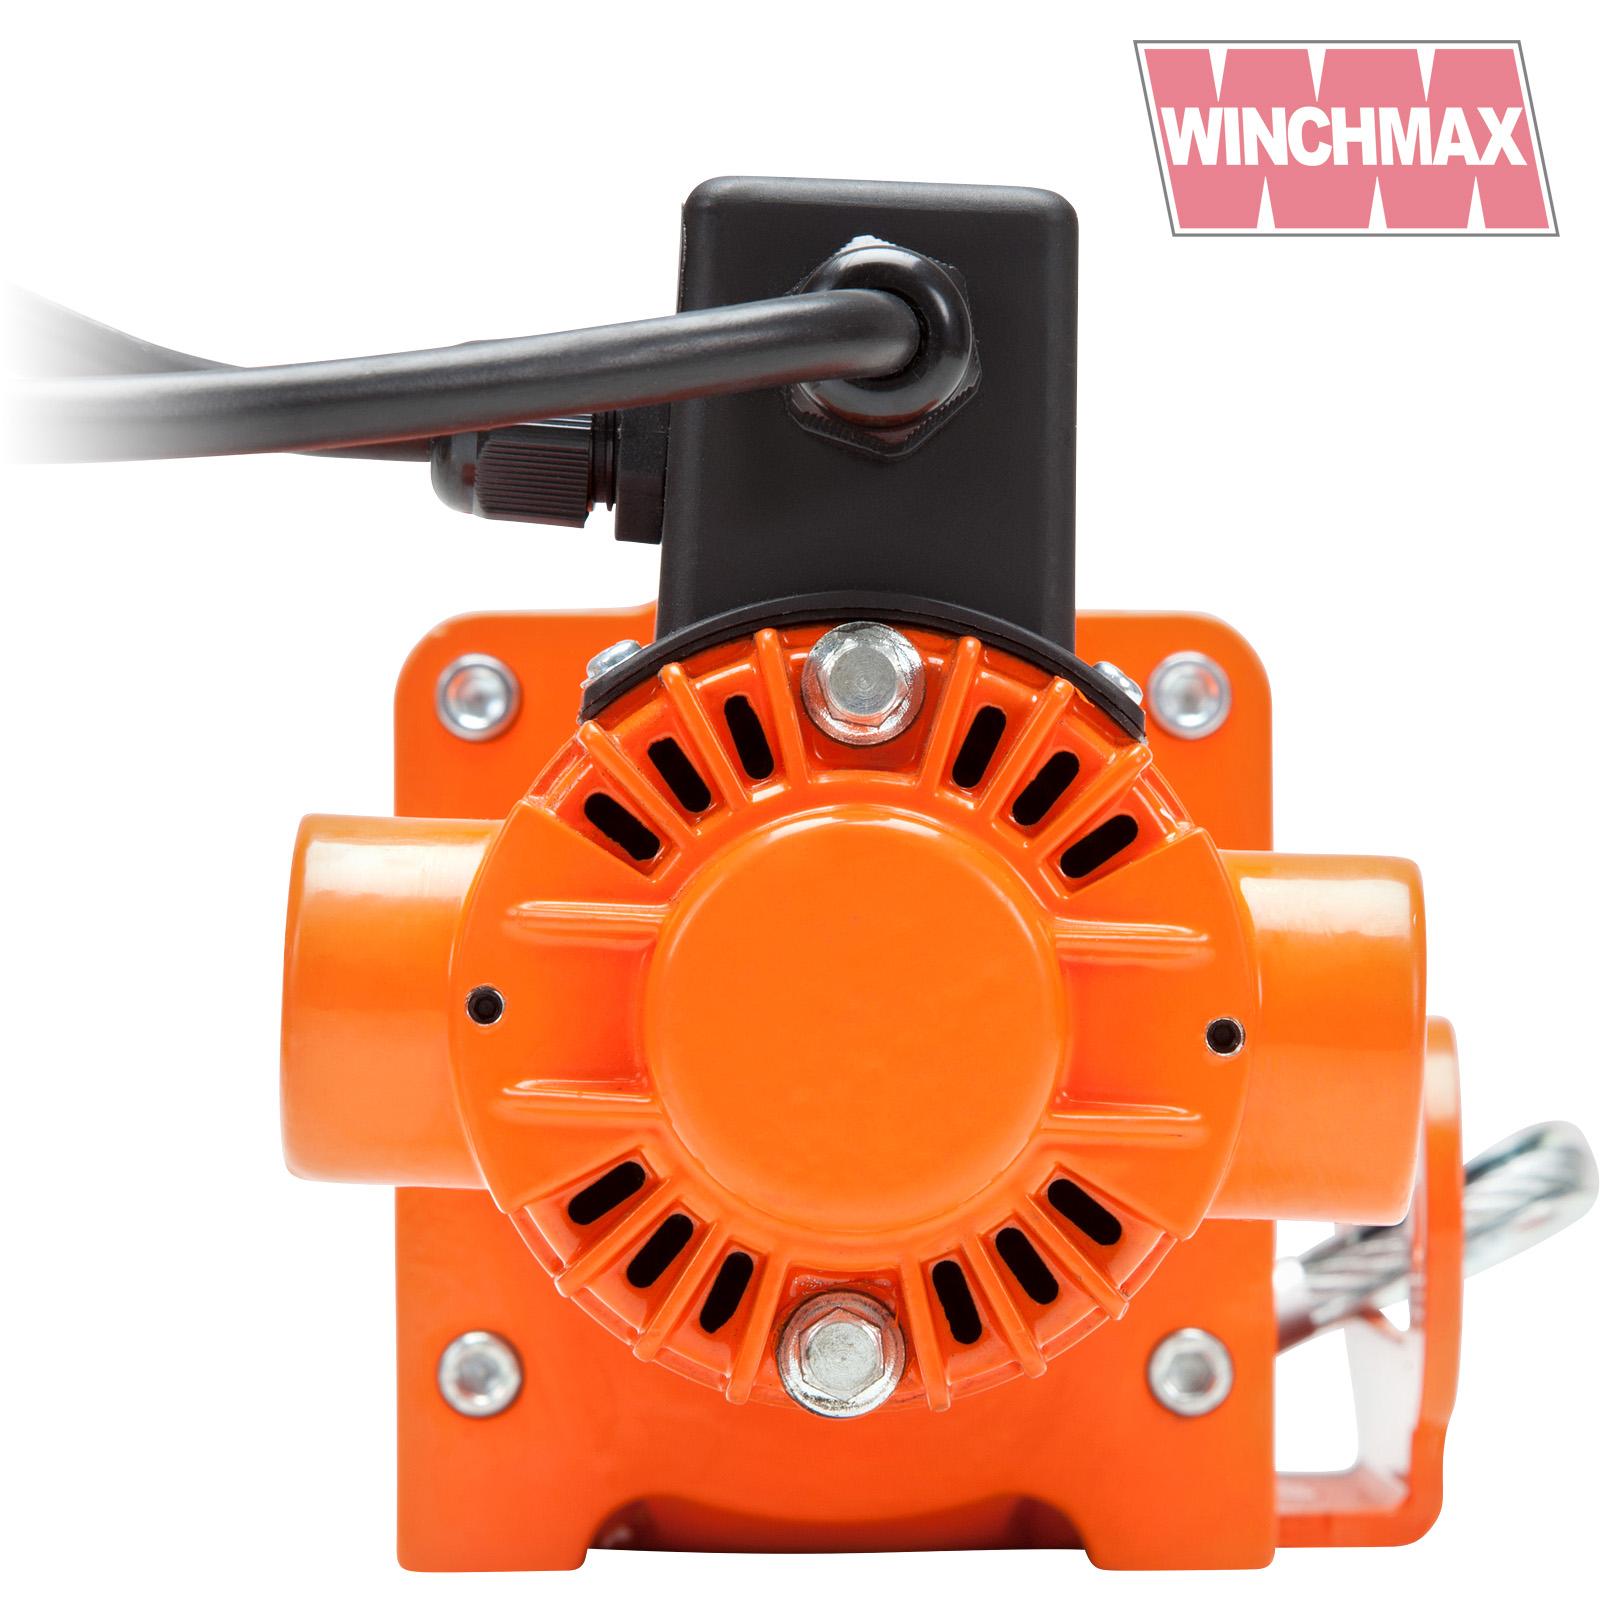 Wmac3000 winchmax 233